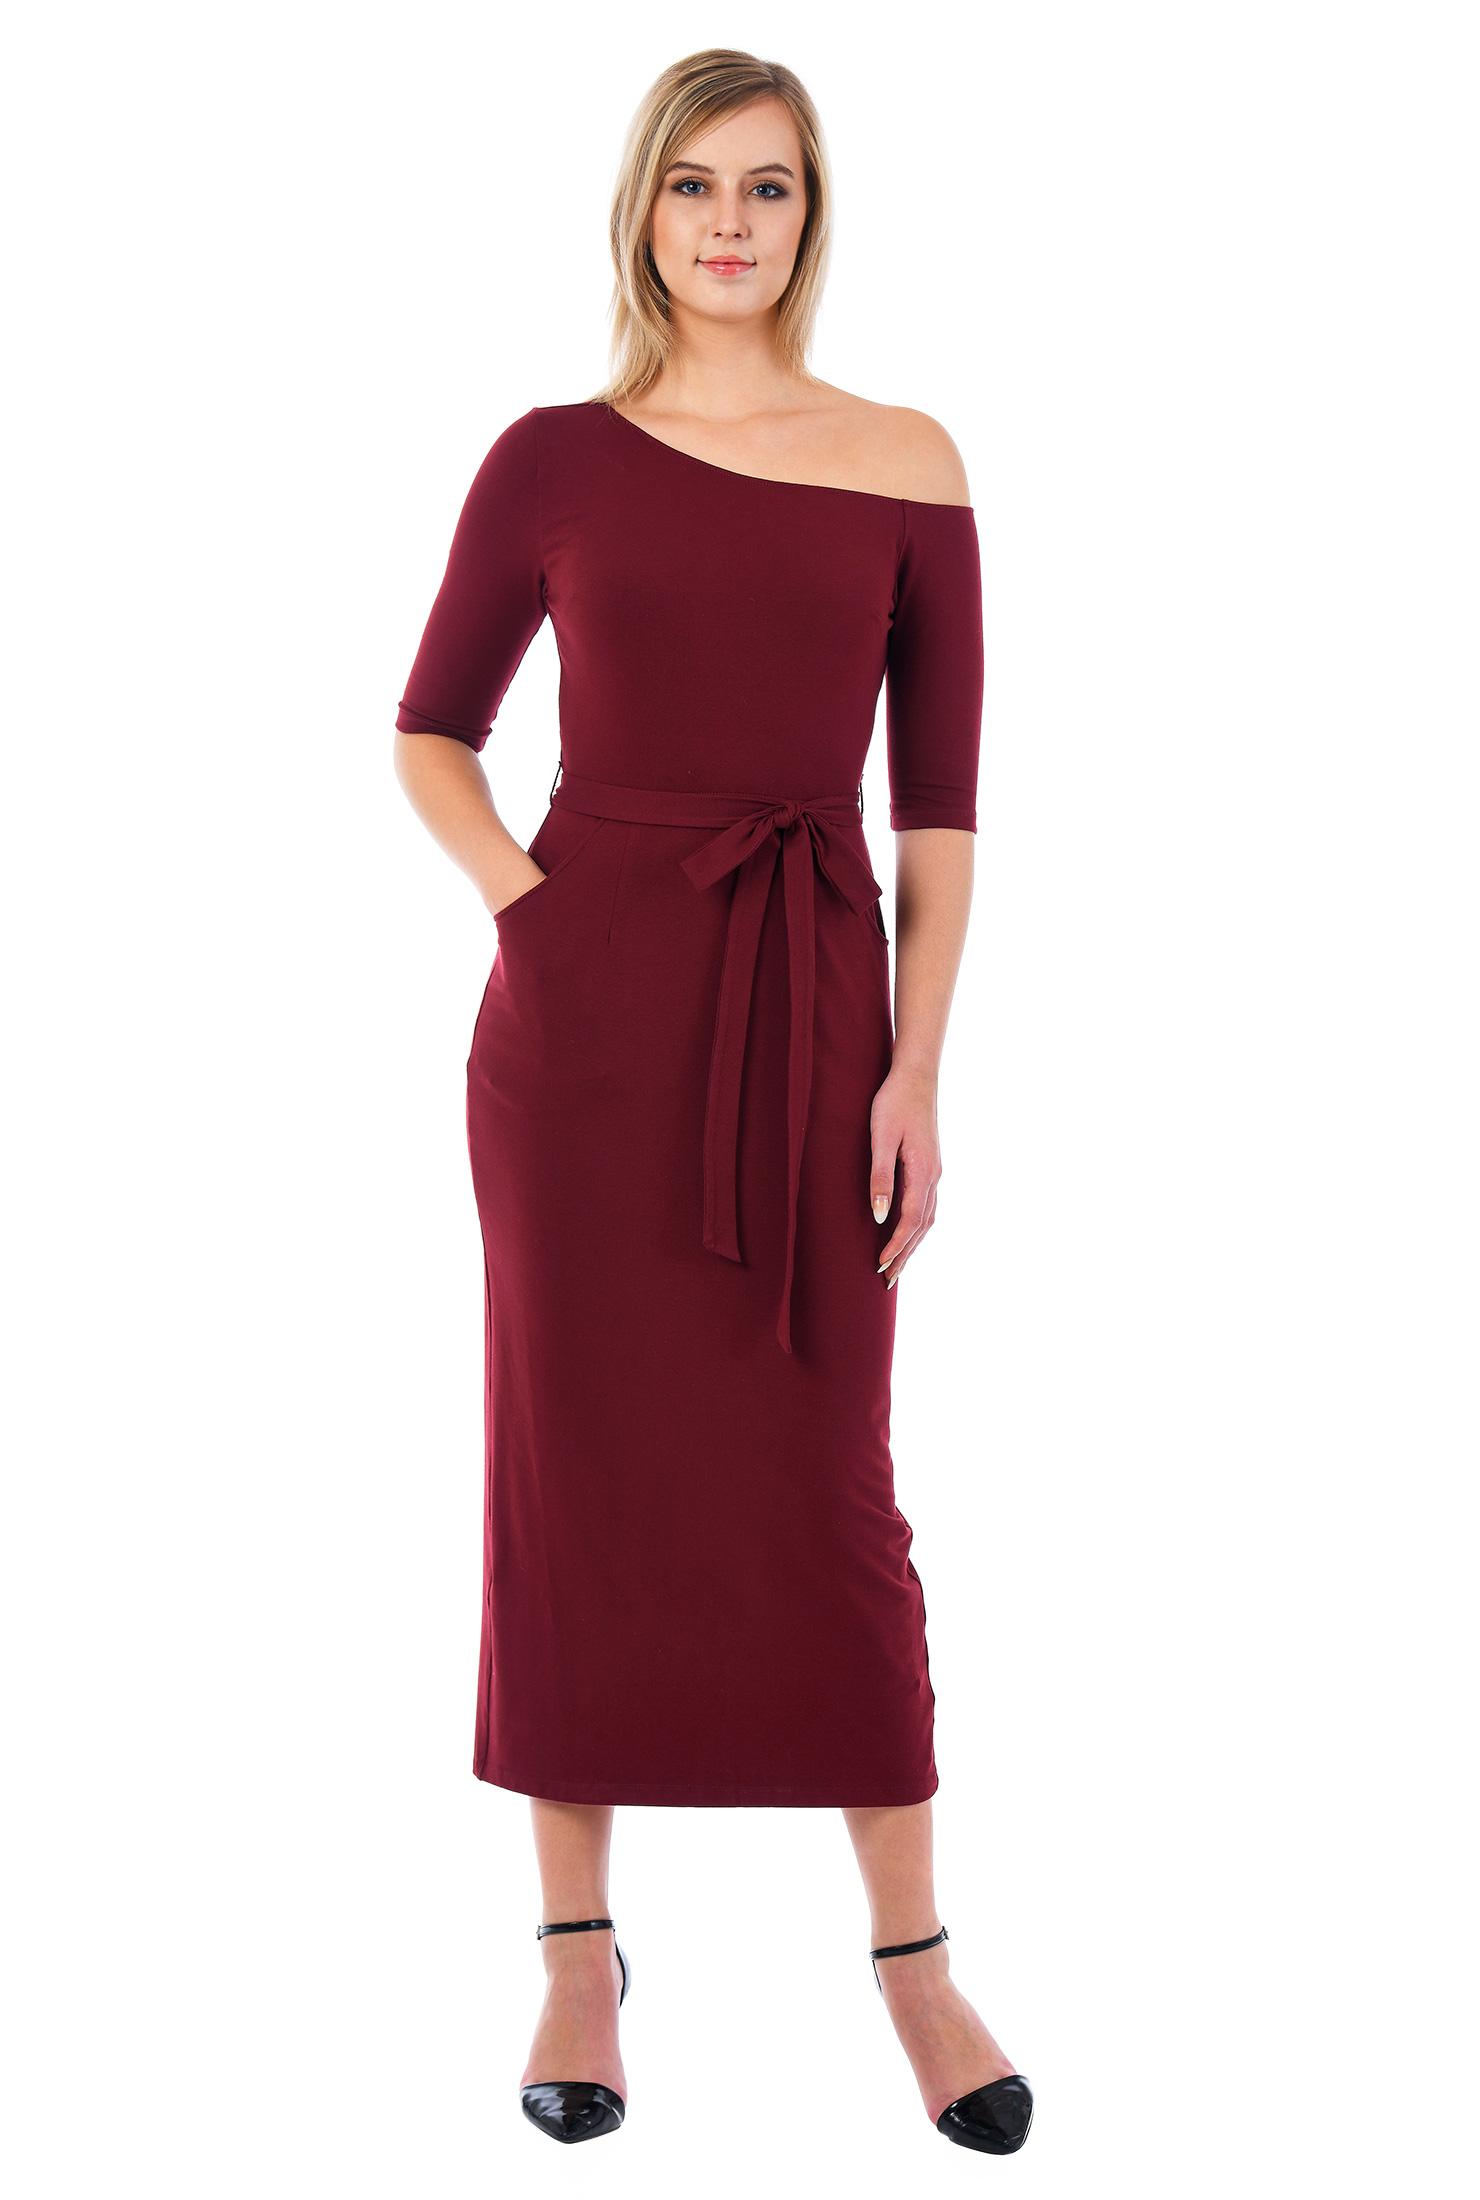 eShakti Women's One shoulder cotton knit midi dress CL0052946